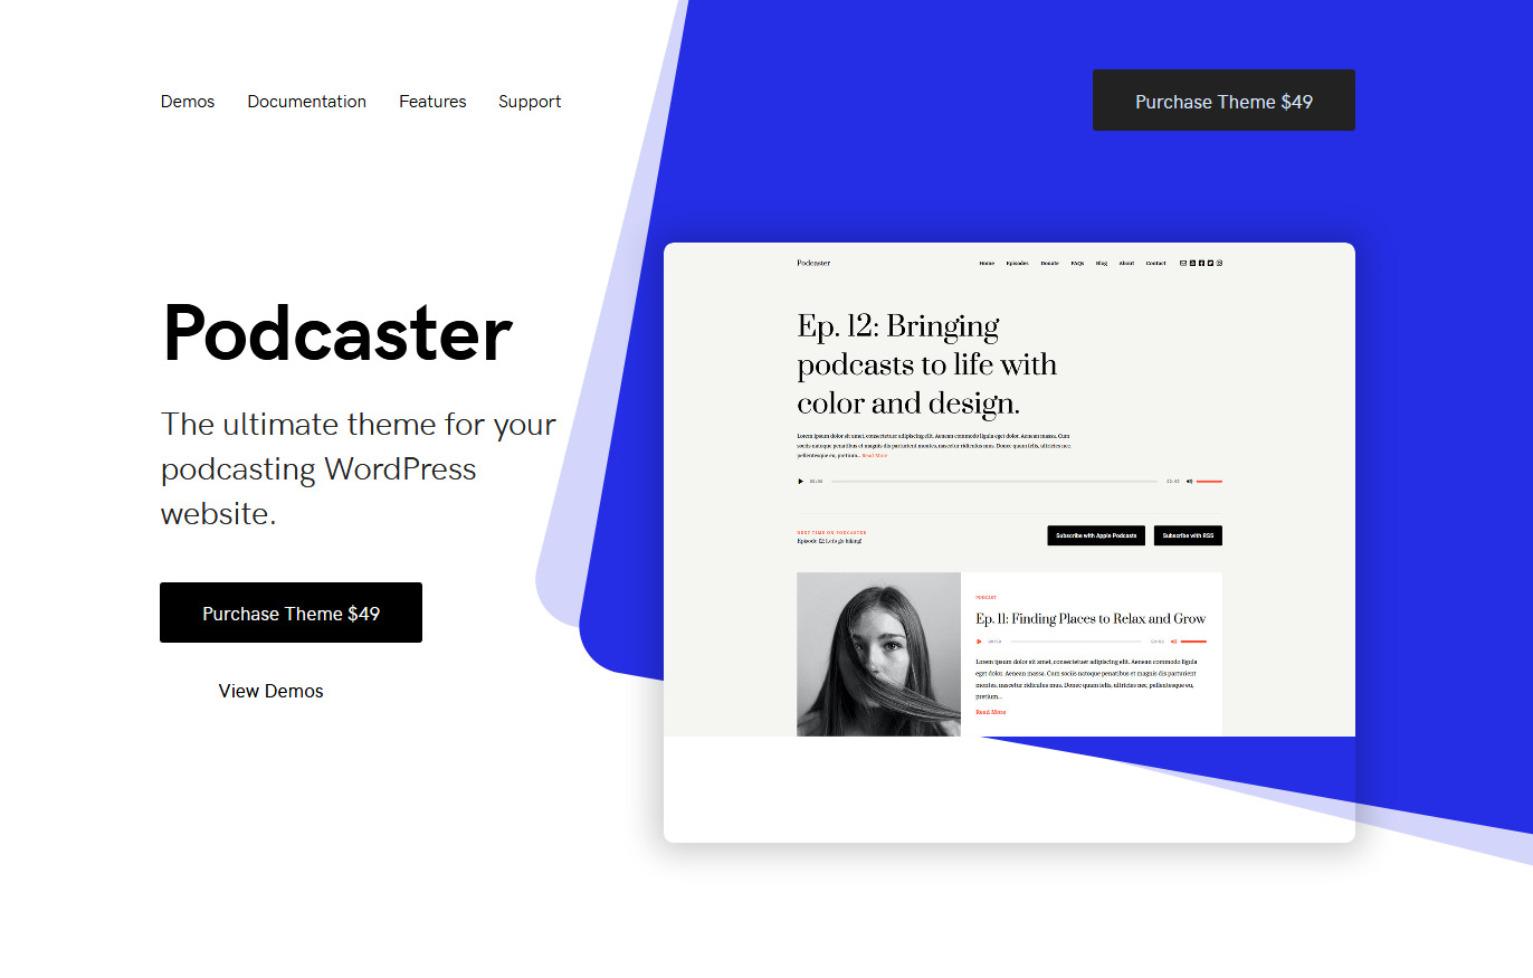 Podcaster Multimedia Podcasting WordPress Theme